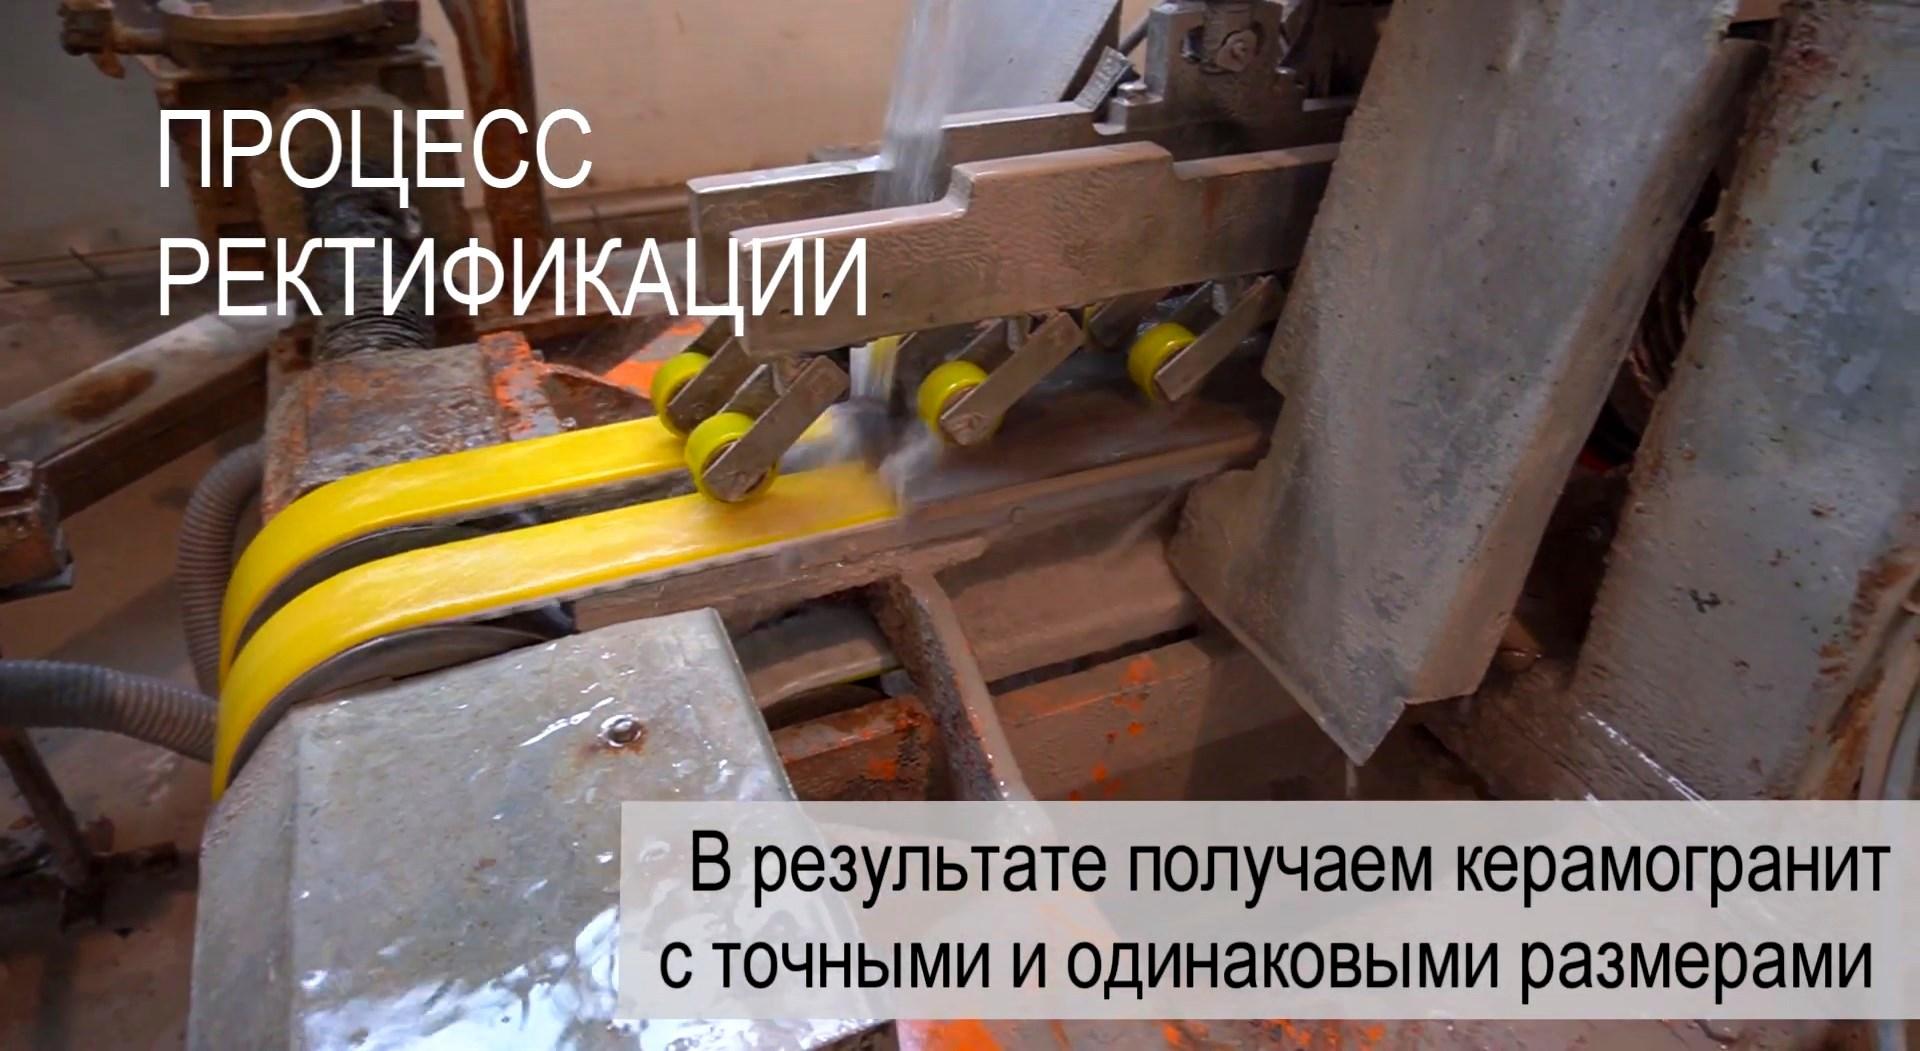 2.5 Ректификация керамогранита обрезка на производстве